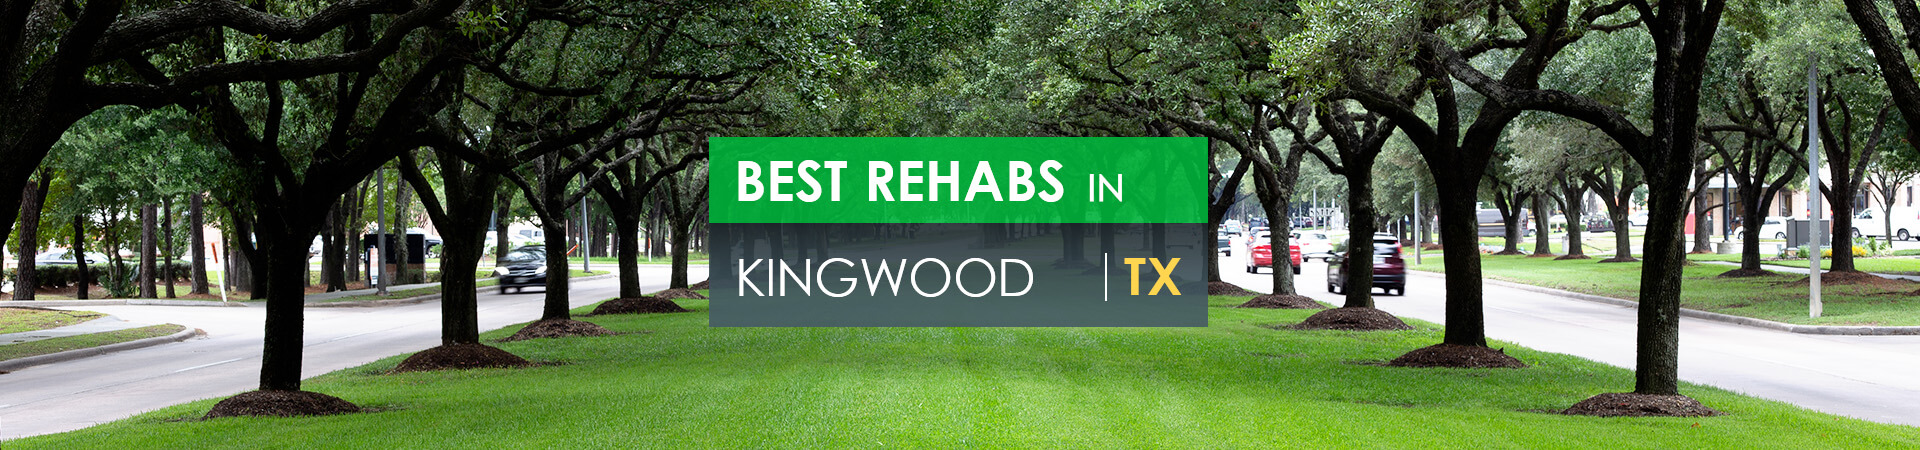 Best rehabs in Kingwood, TX